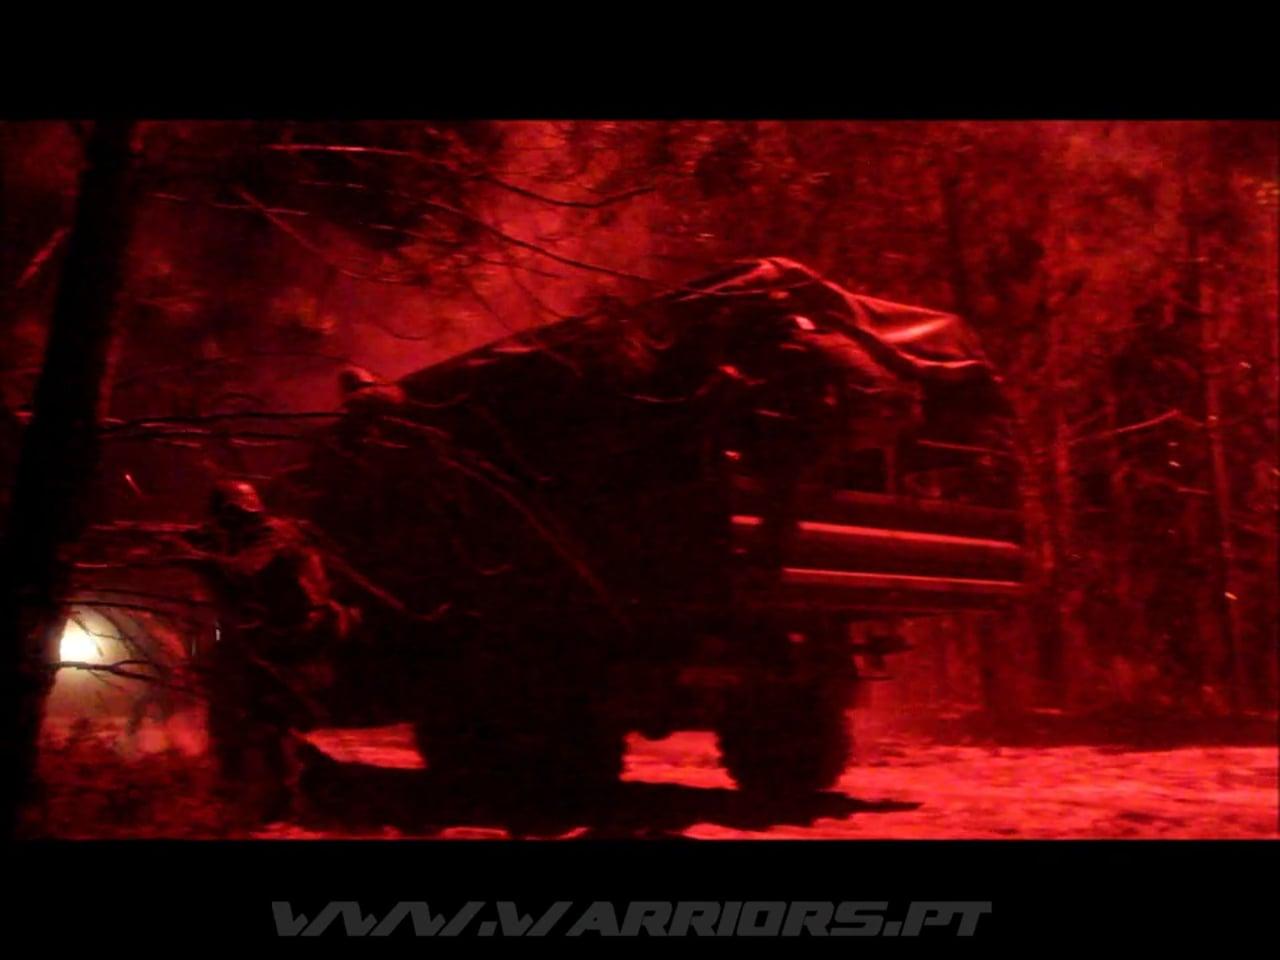 Fuzileiros Portugueses - Night Ambush